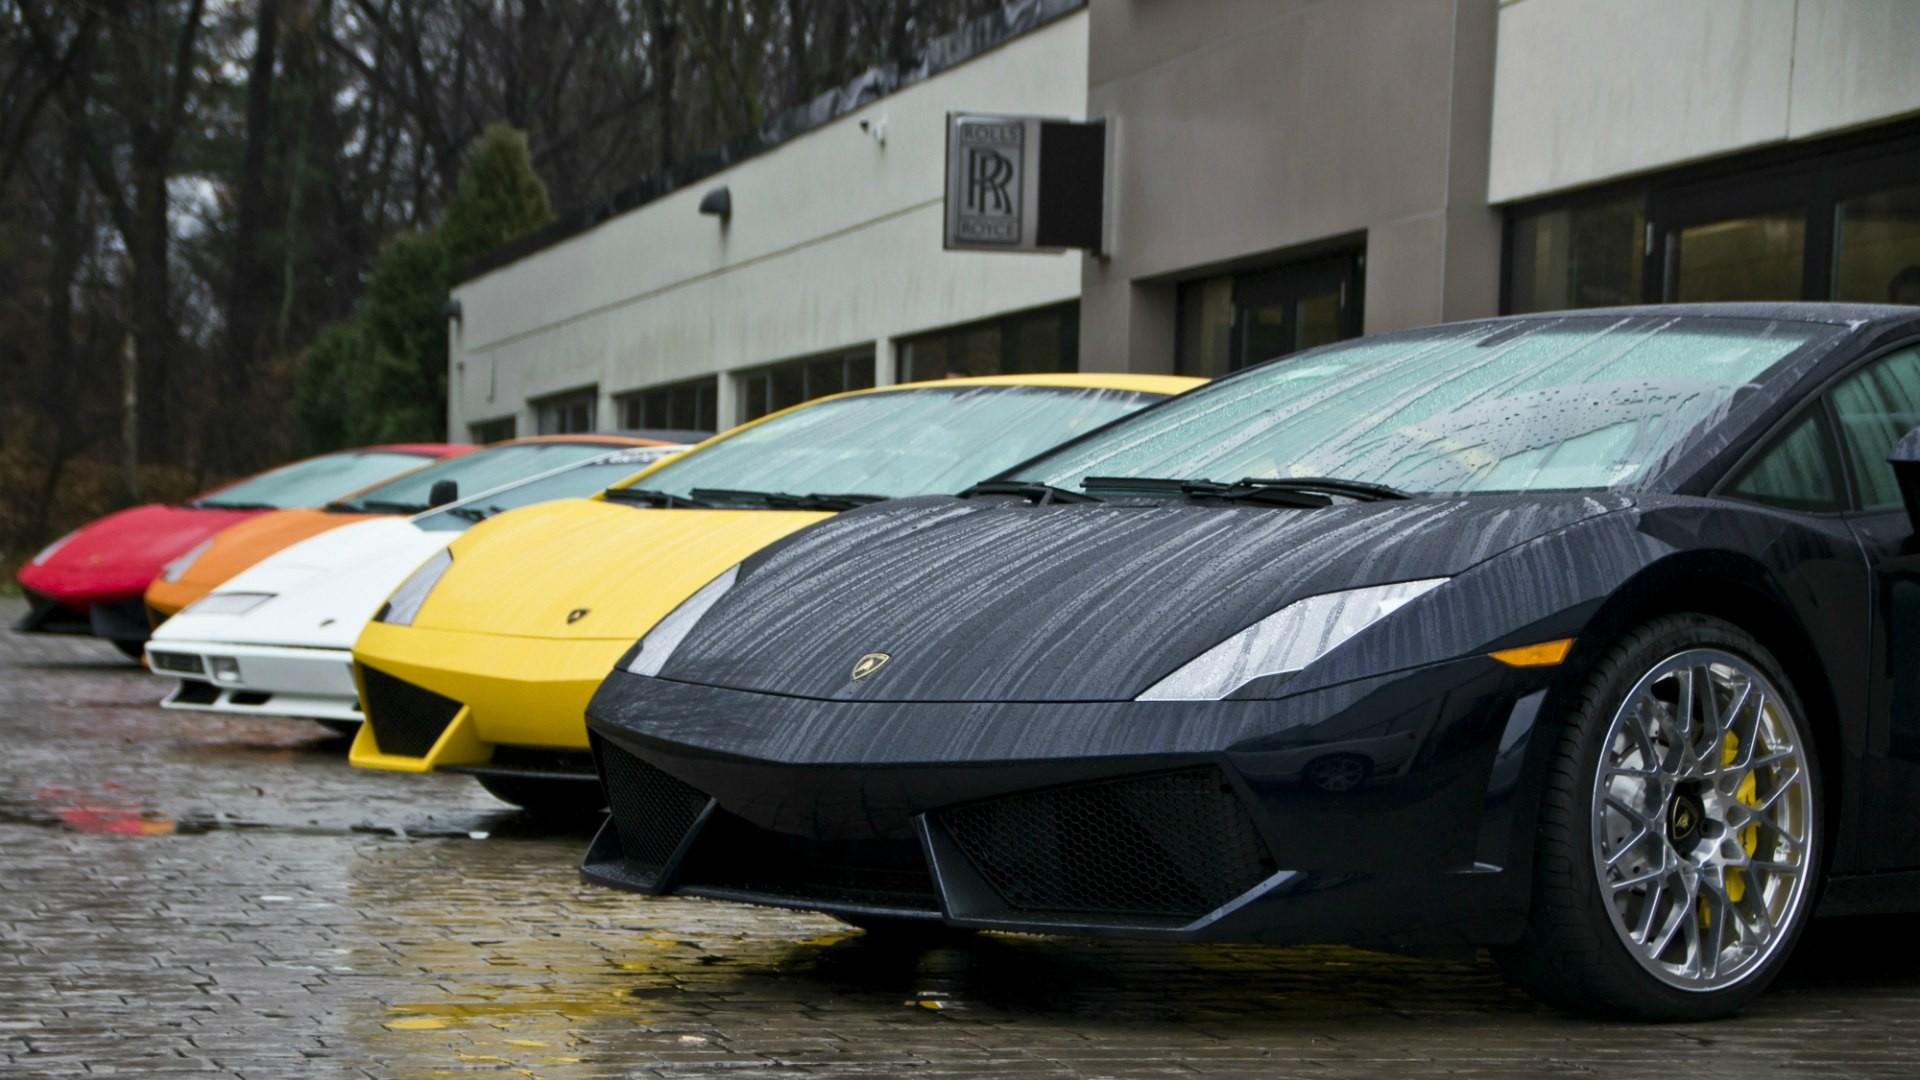 uploads201411lamborghini cars 1080p - Super Cool Cars Wallpapers Hd